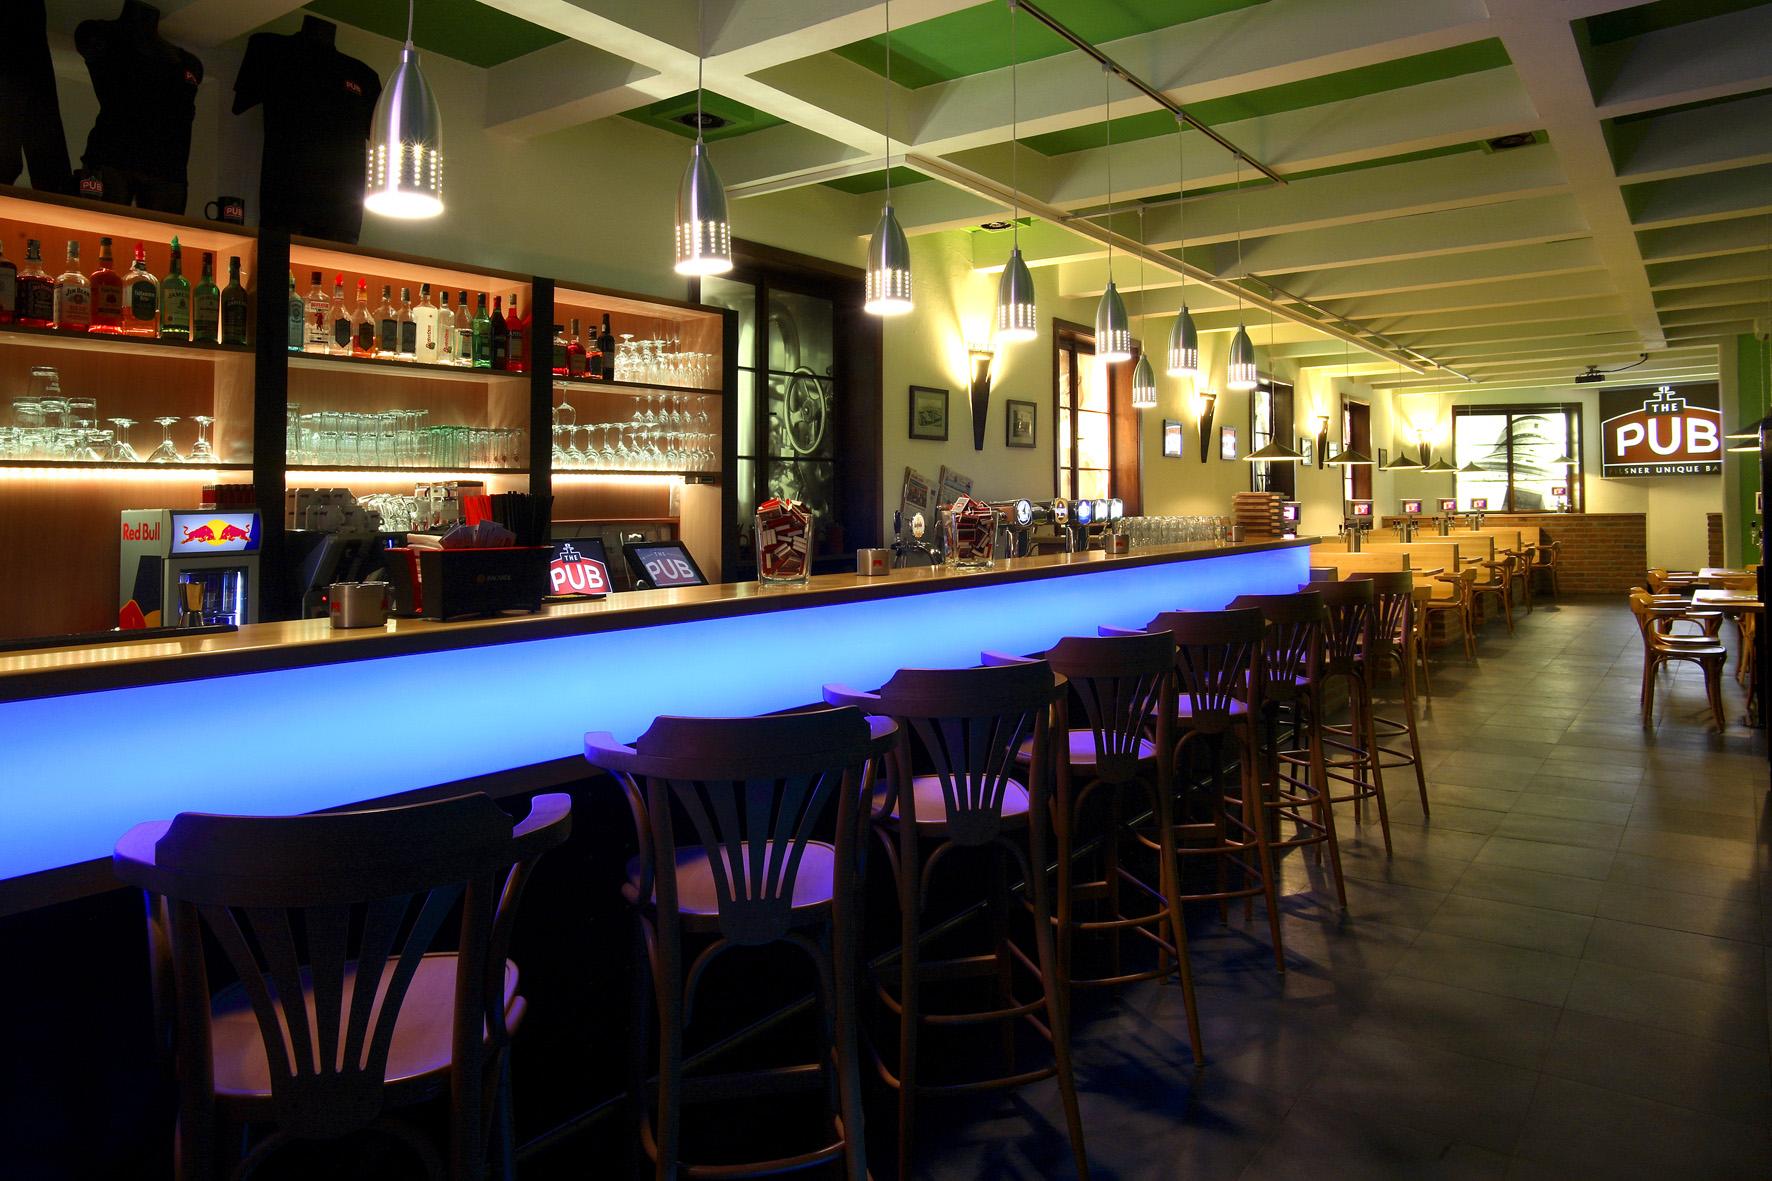 The-Pub-Prague